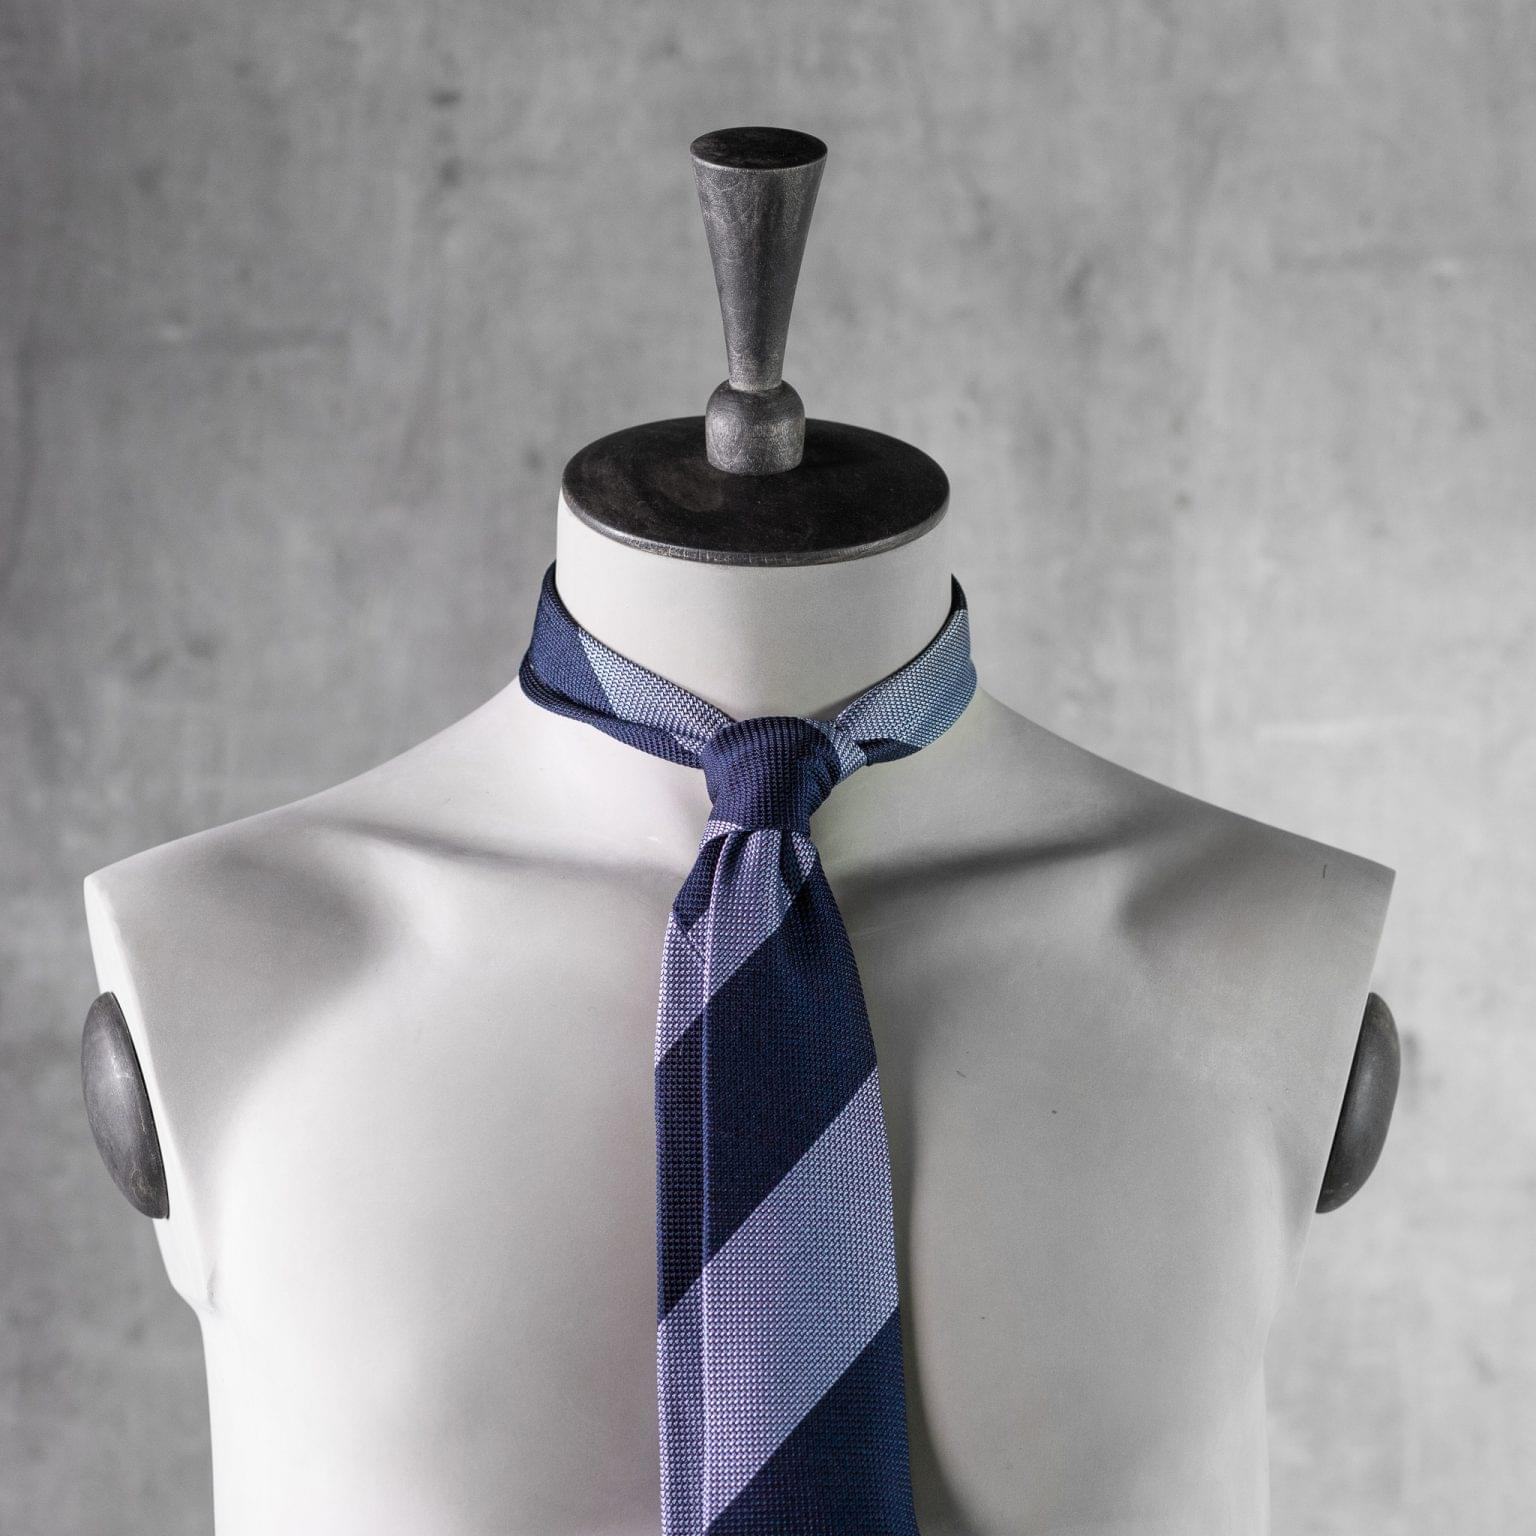 GRENADINE-0522-Tie-Initials-Corbata-Iniciales-The-Seelk-3